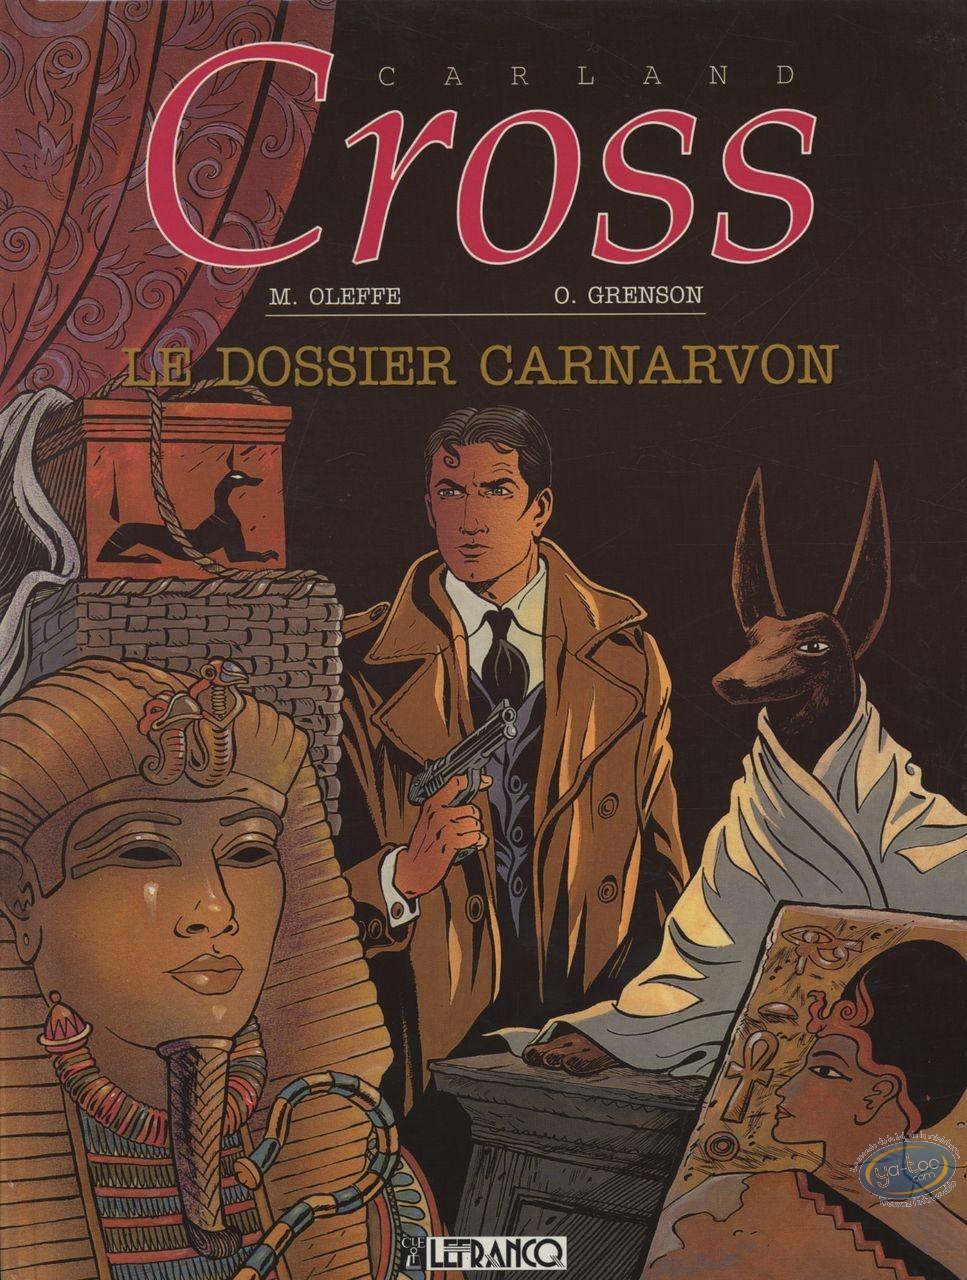 Reduced price European comic books, Carland Cross : Le Dossier Carnarvon